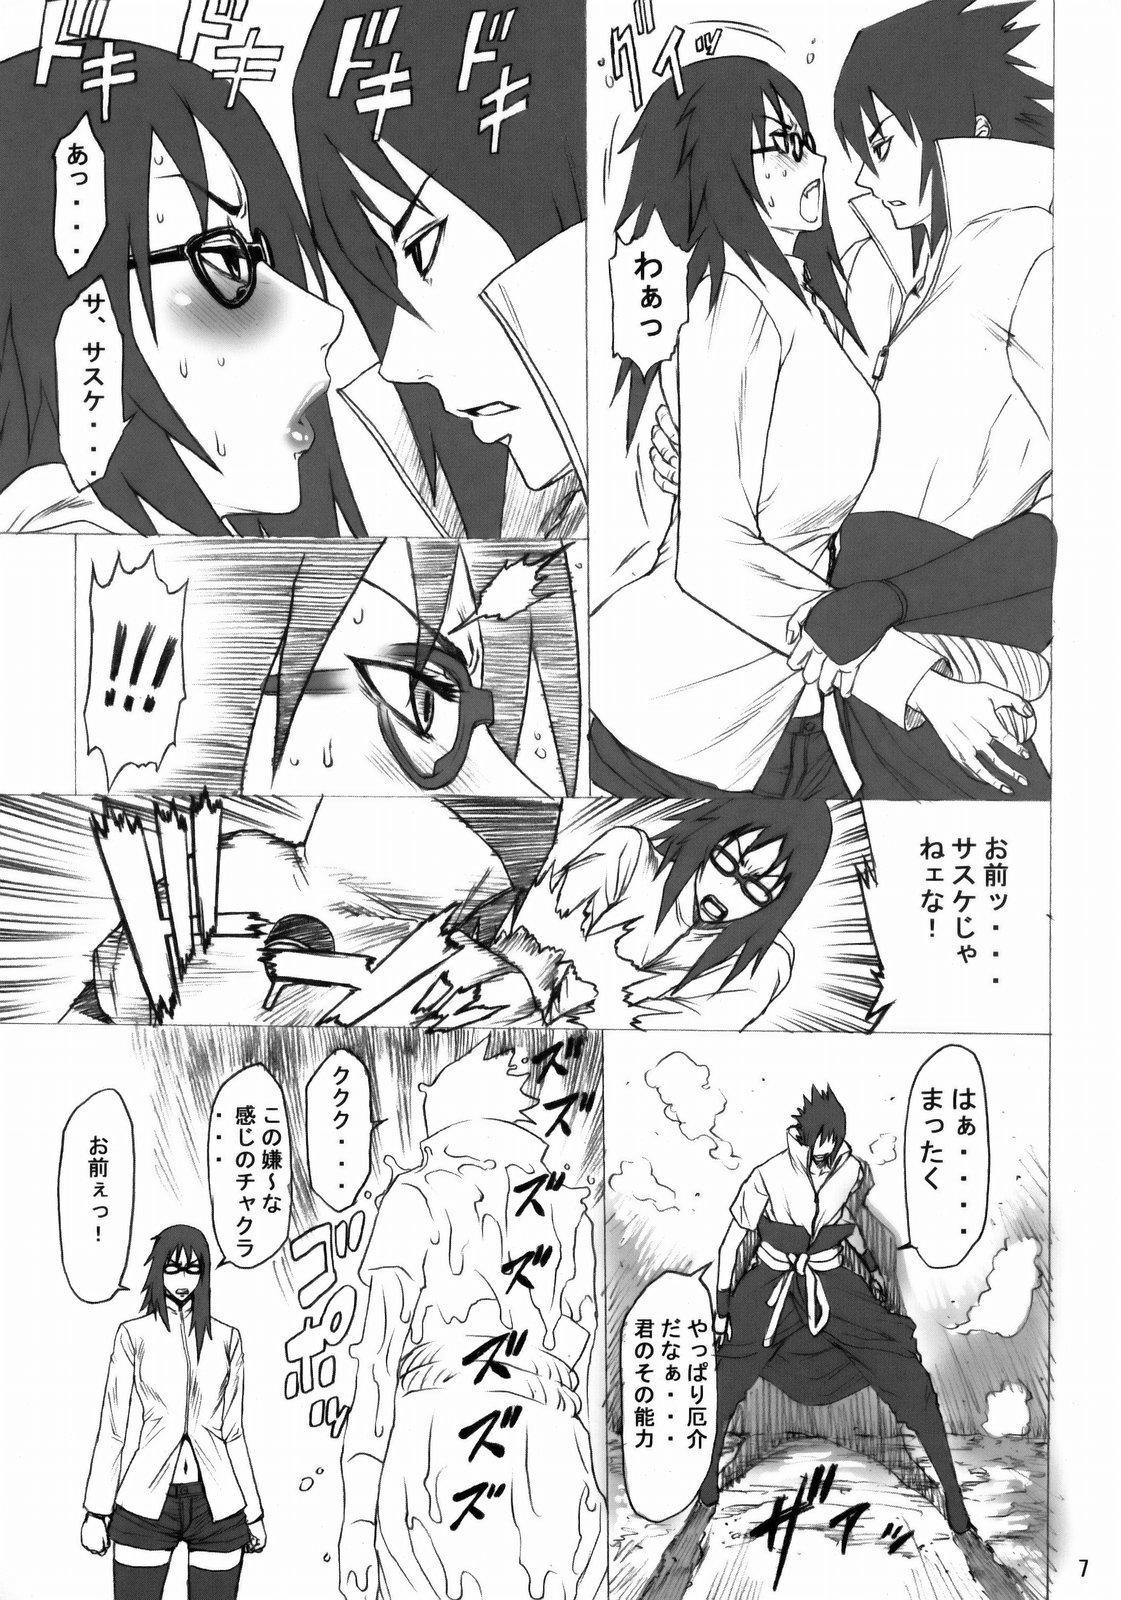 NINJA EXTREME 3 Onna Goroshi Shippuuden 5